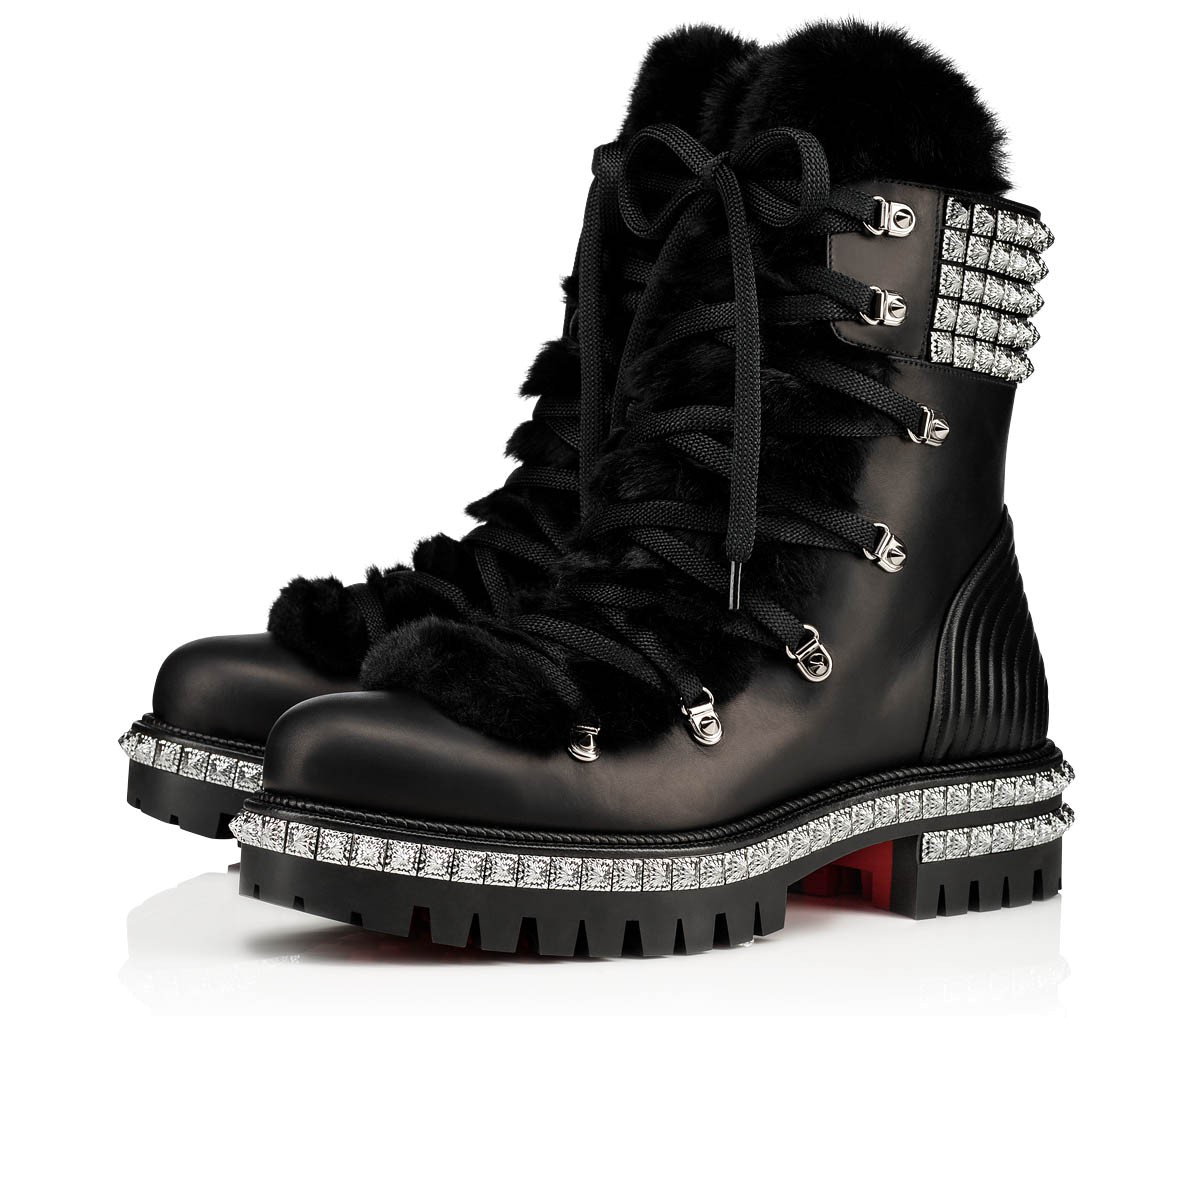 Shoes - Yeti - Christian Louboutin